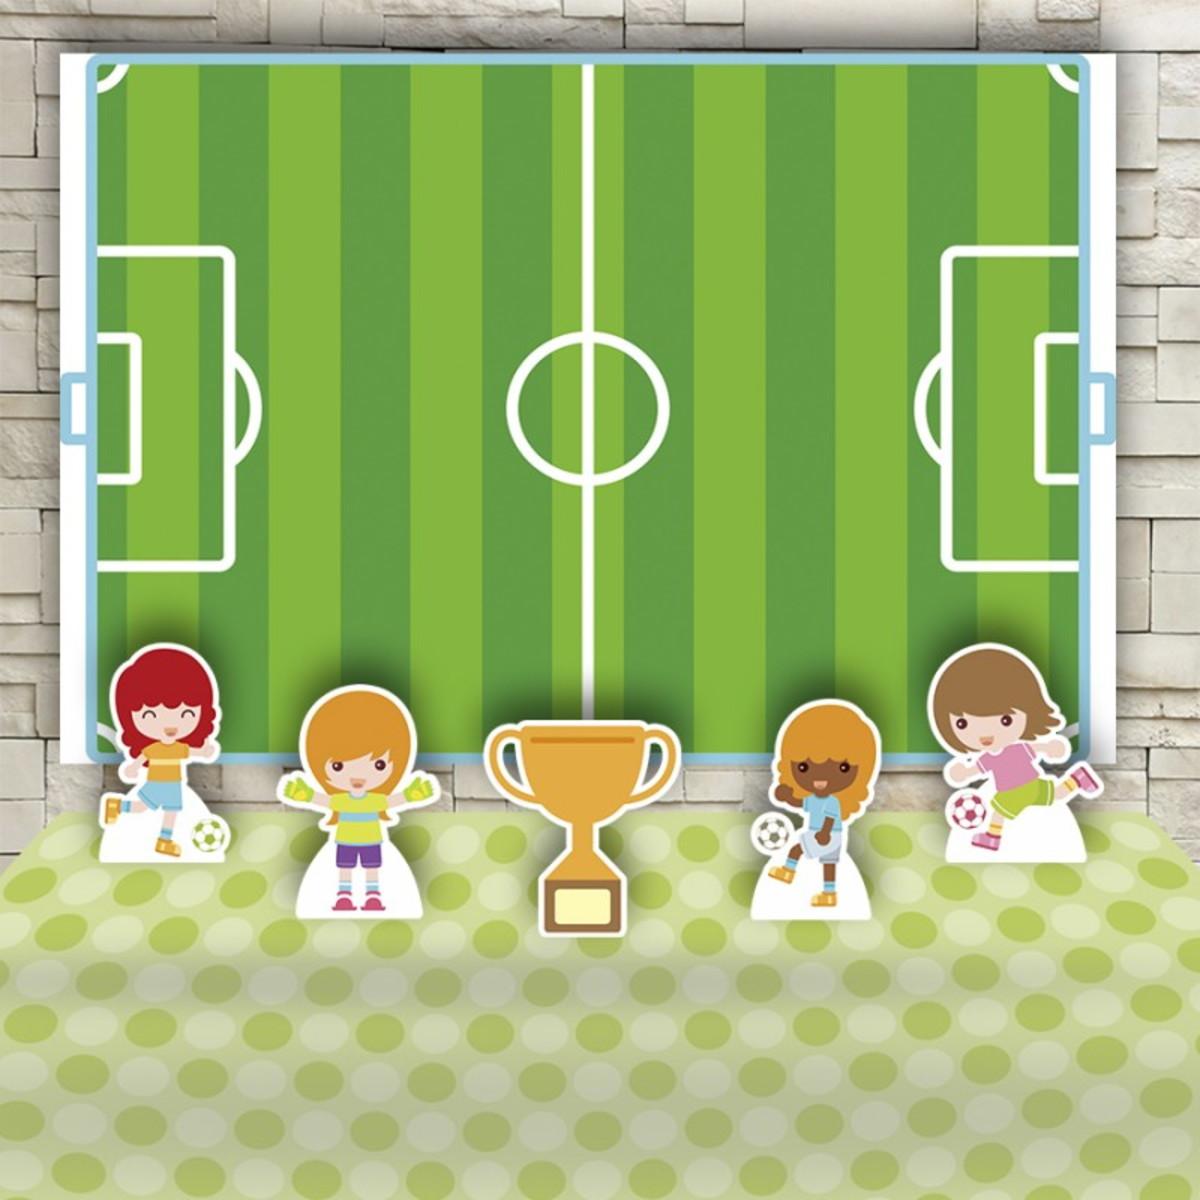 bfe6391d0c1ccb Kit Festa Prata Painel + Display Futebol no Elo7 | Impakto Visual ...